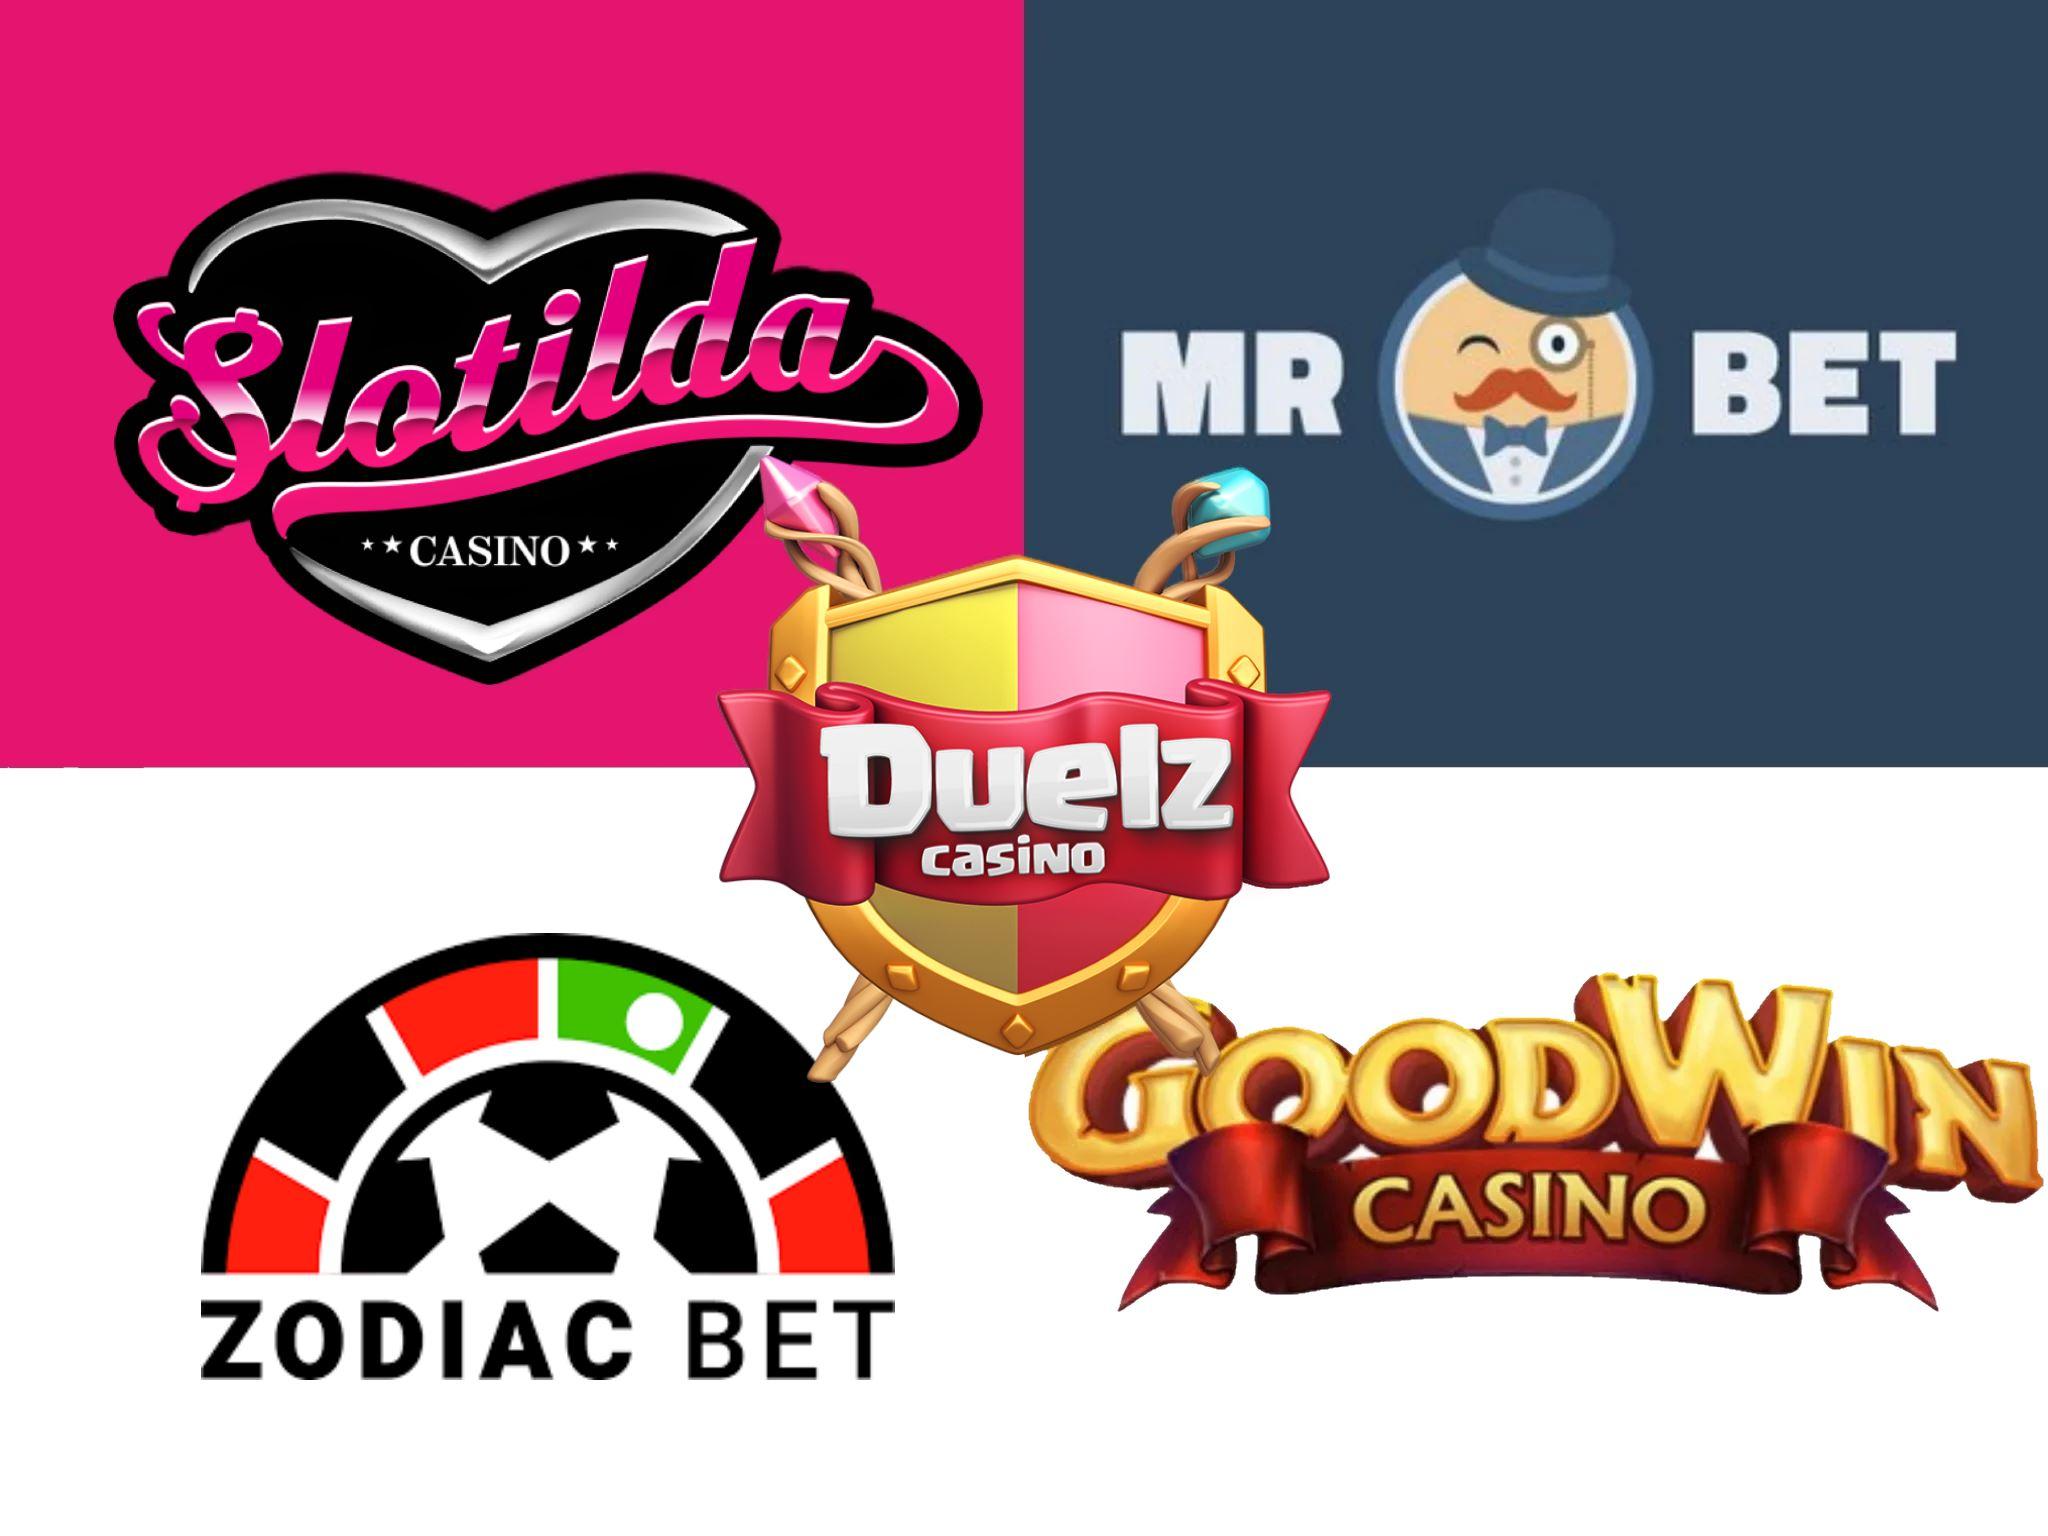 Top 10 Free Online Casino Sites of 2018